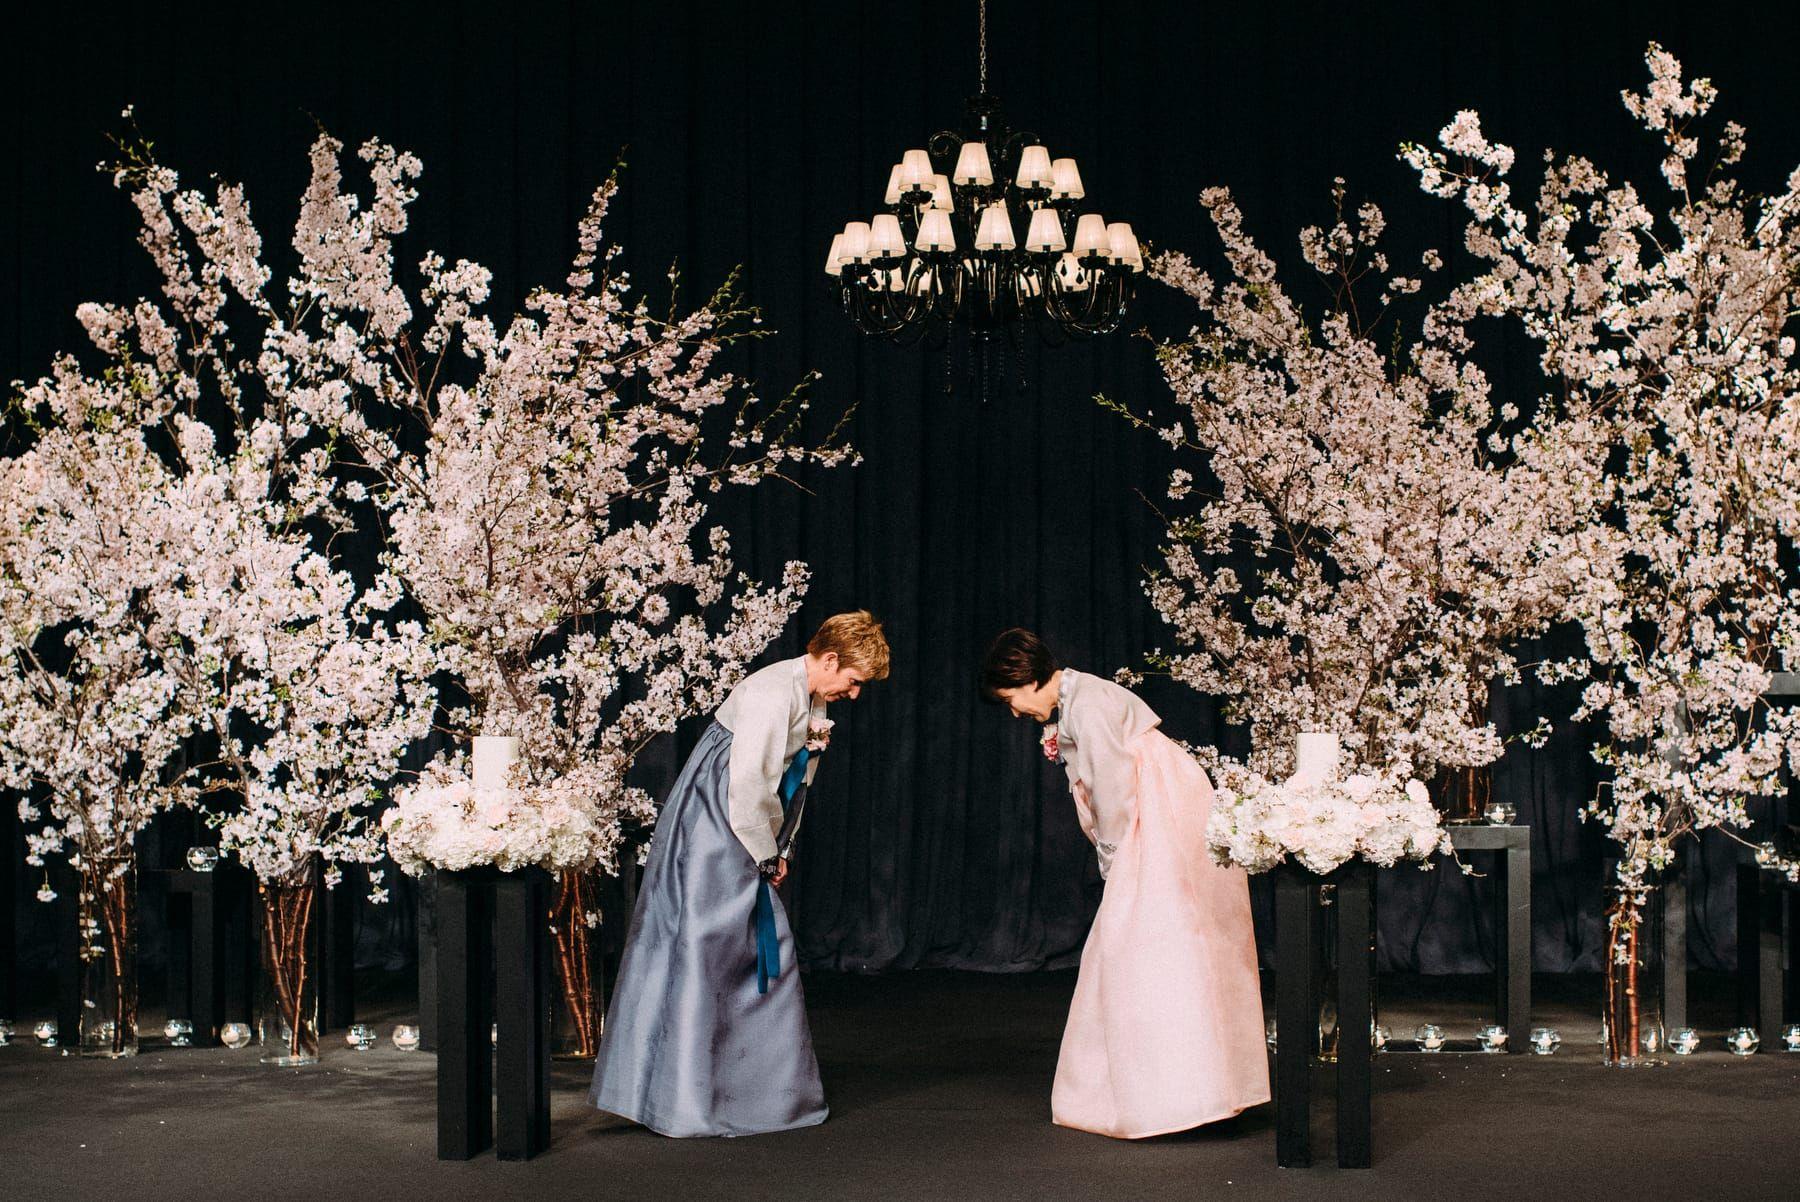 Korean Wedding At Grand Hyatt Hotel In Seoul Wedding Decoration